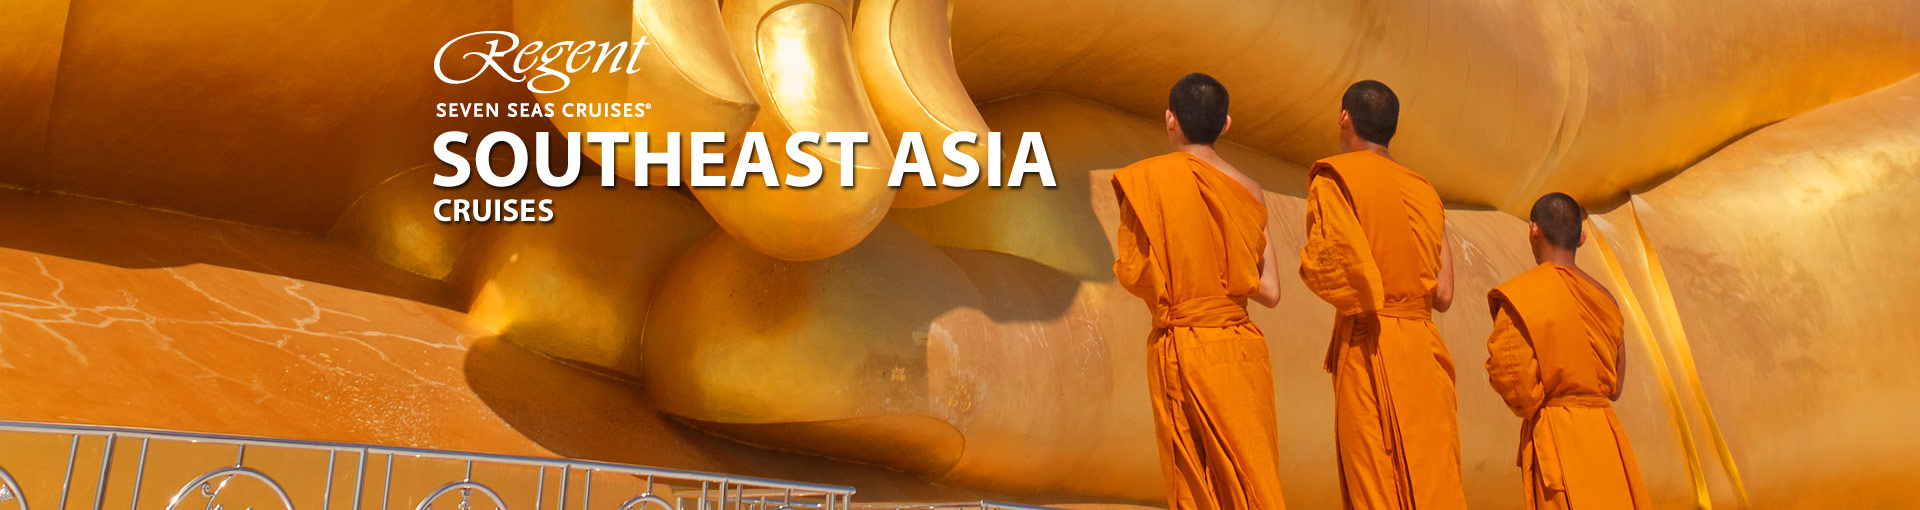 Regent Seven Seas Cruises Southeast Asia Cruises